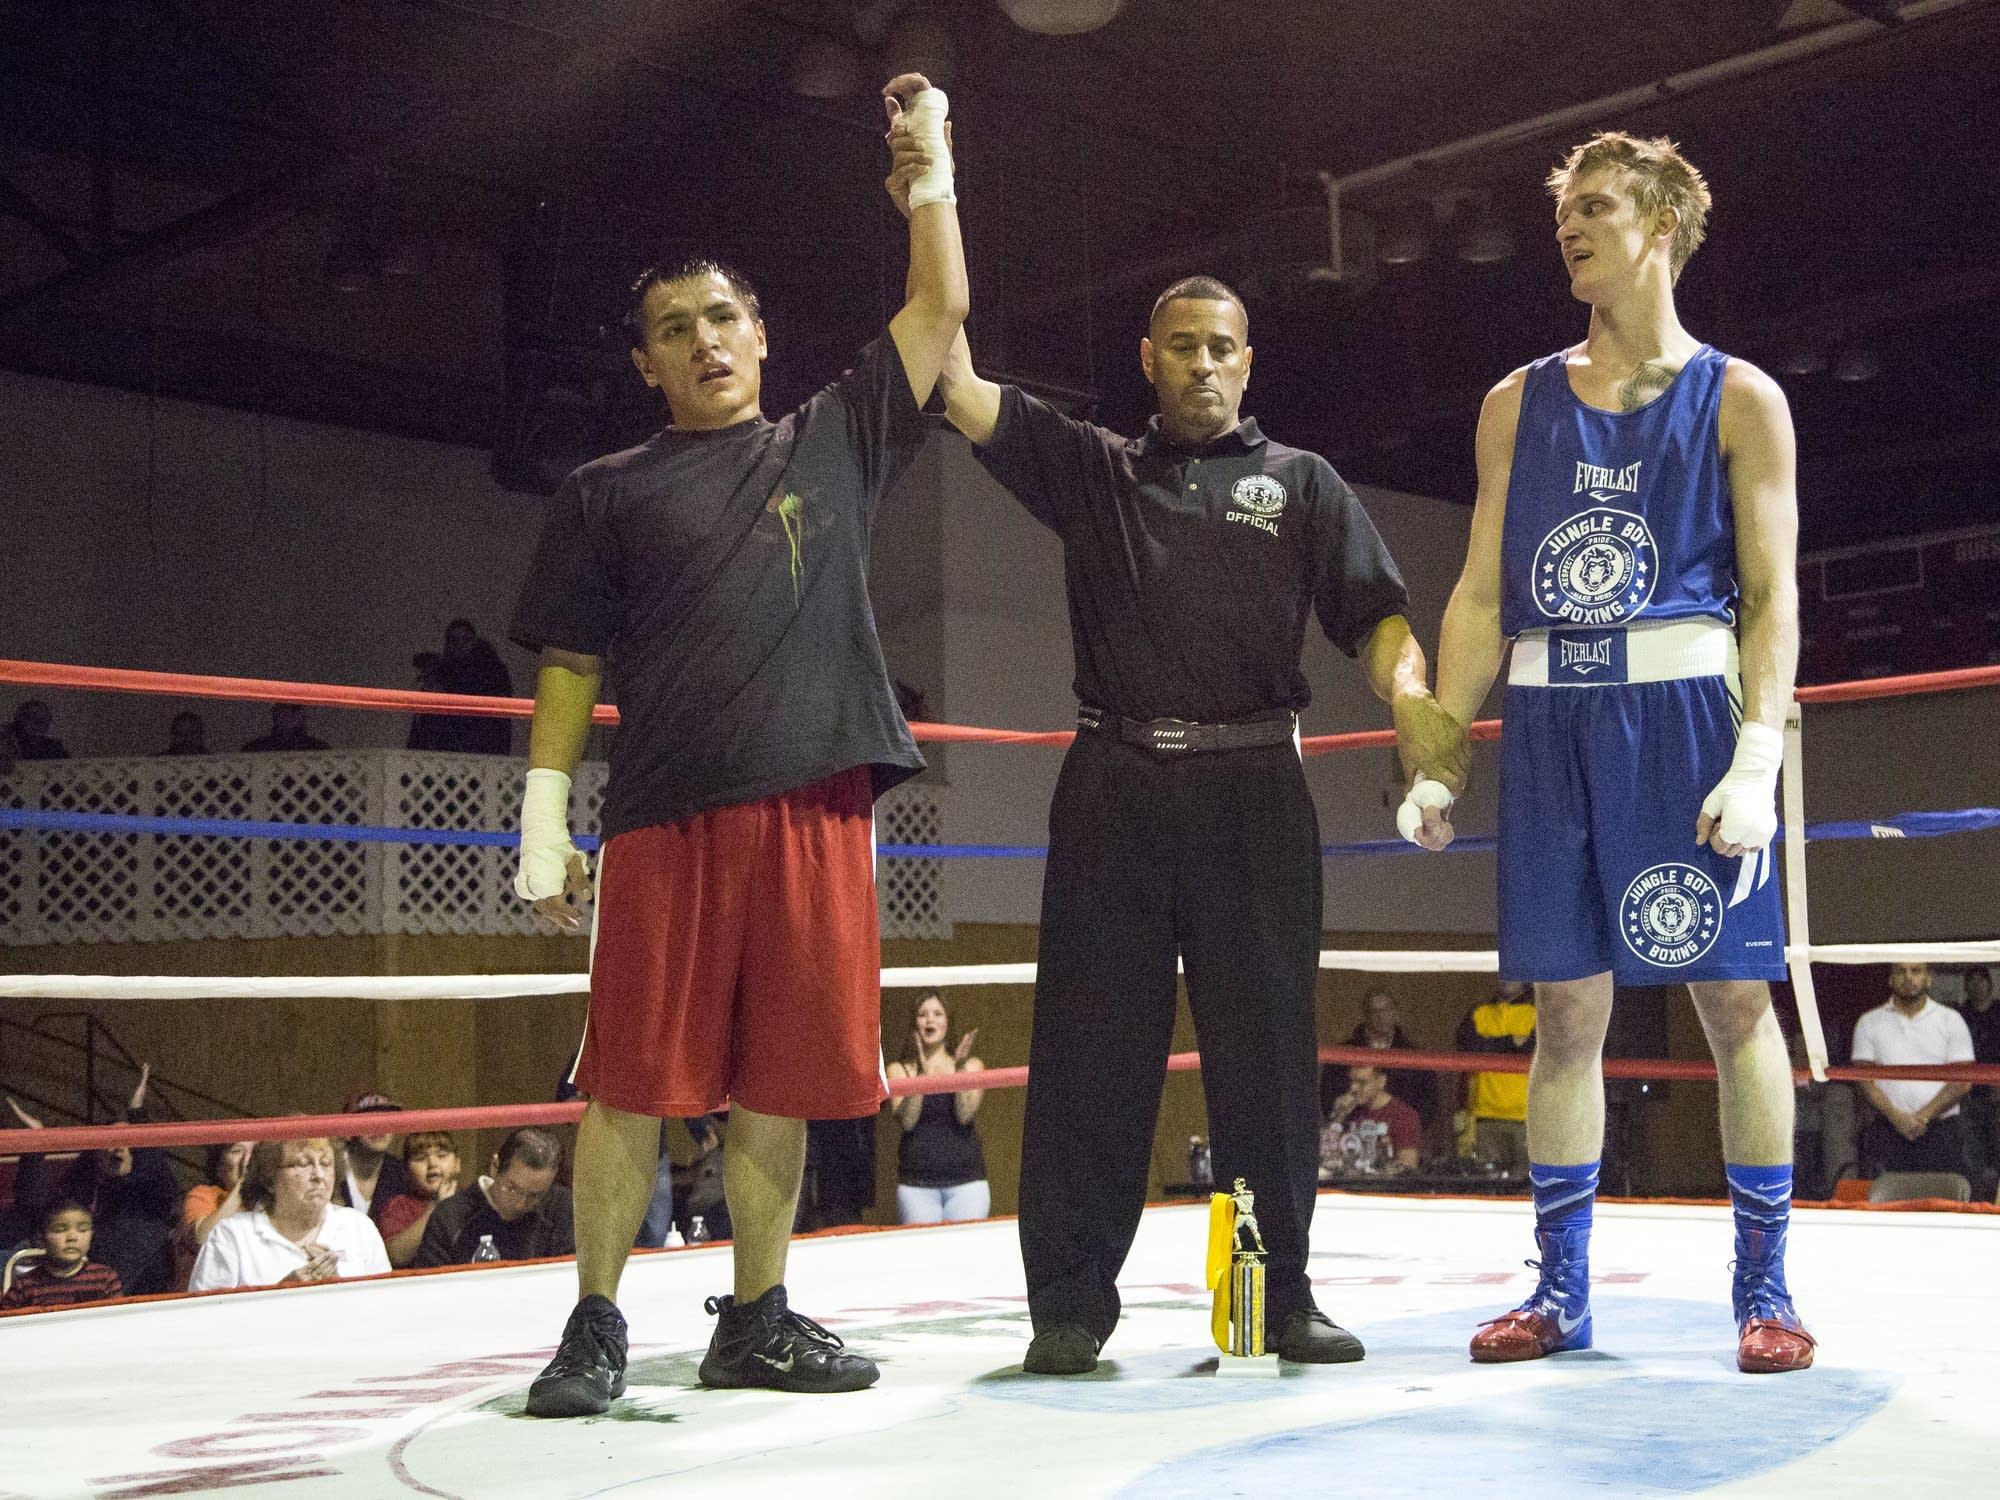 Zack Morrison is declared winner over Danny Huffman, Jungle Boys, Duluth.